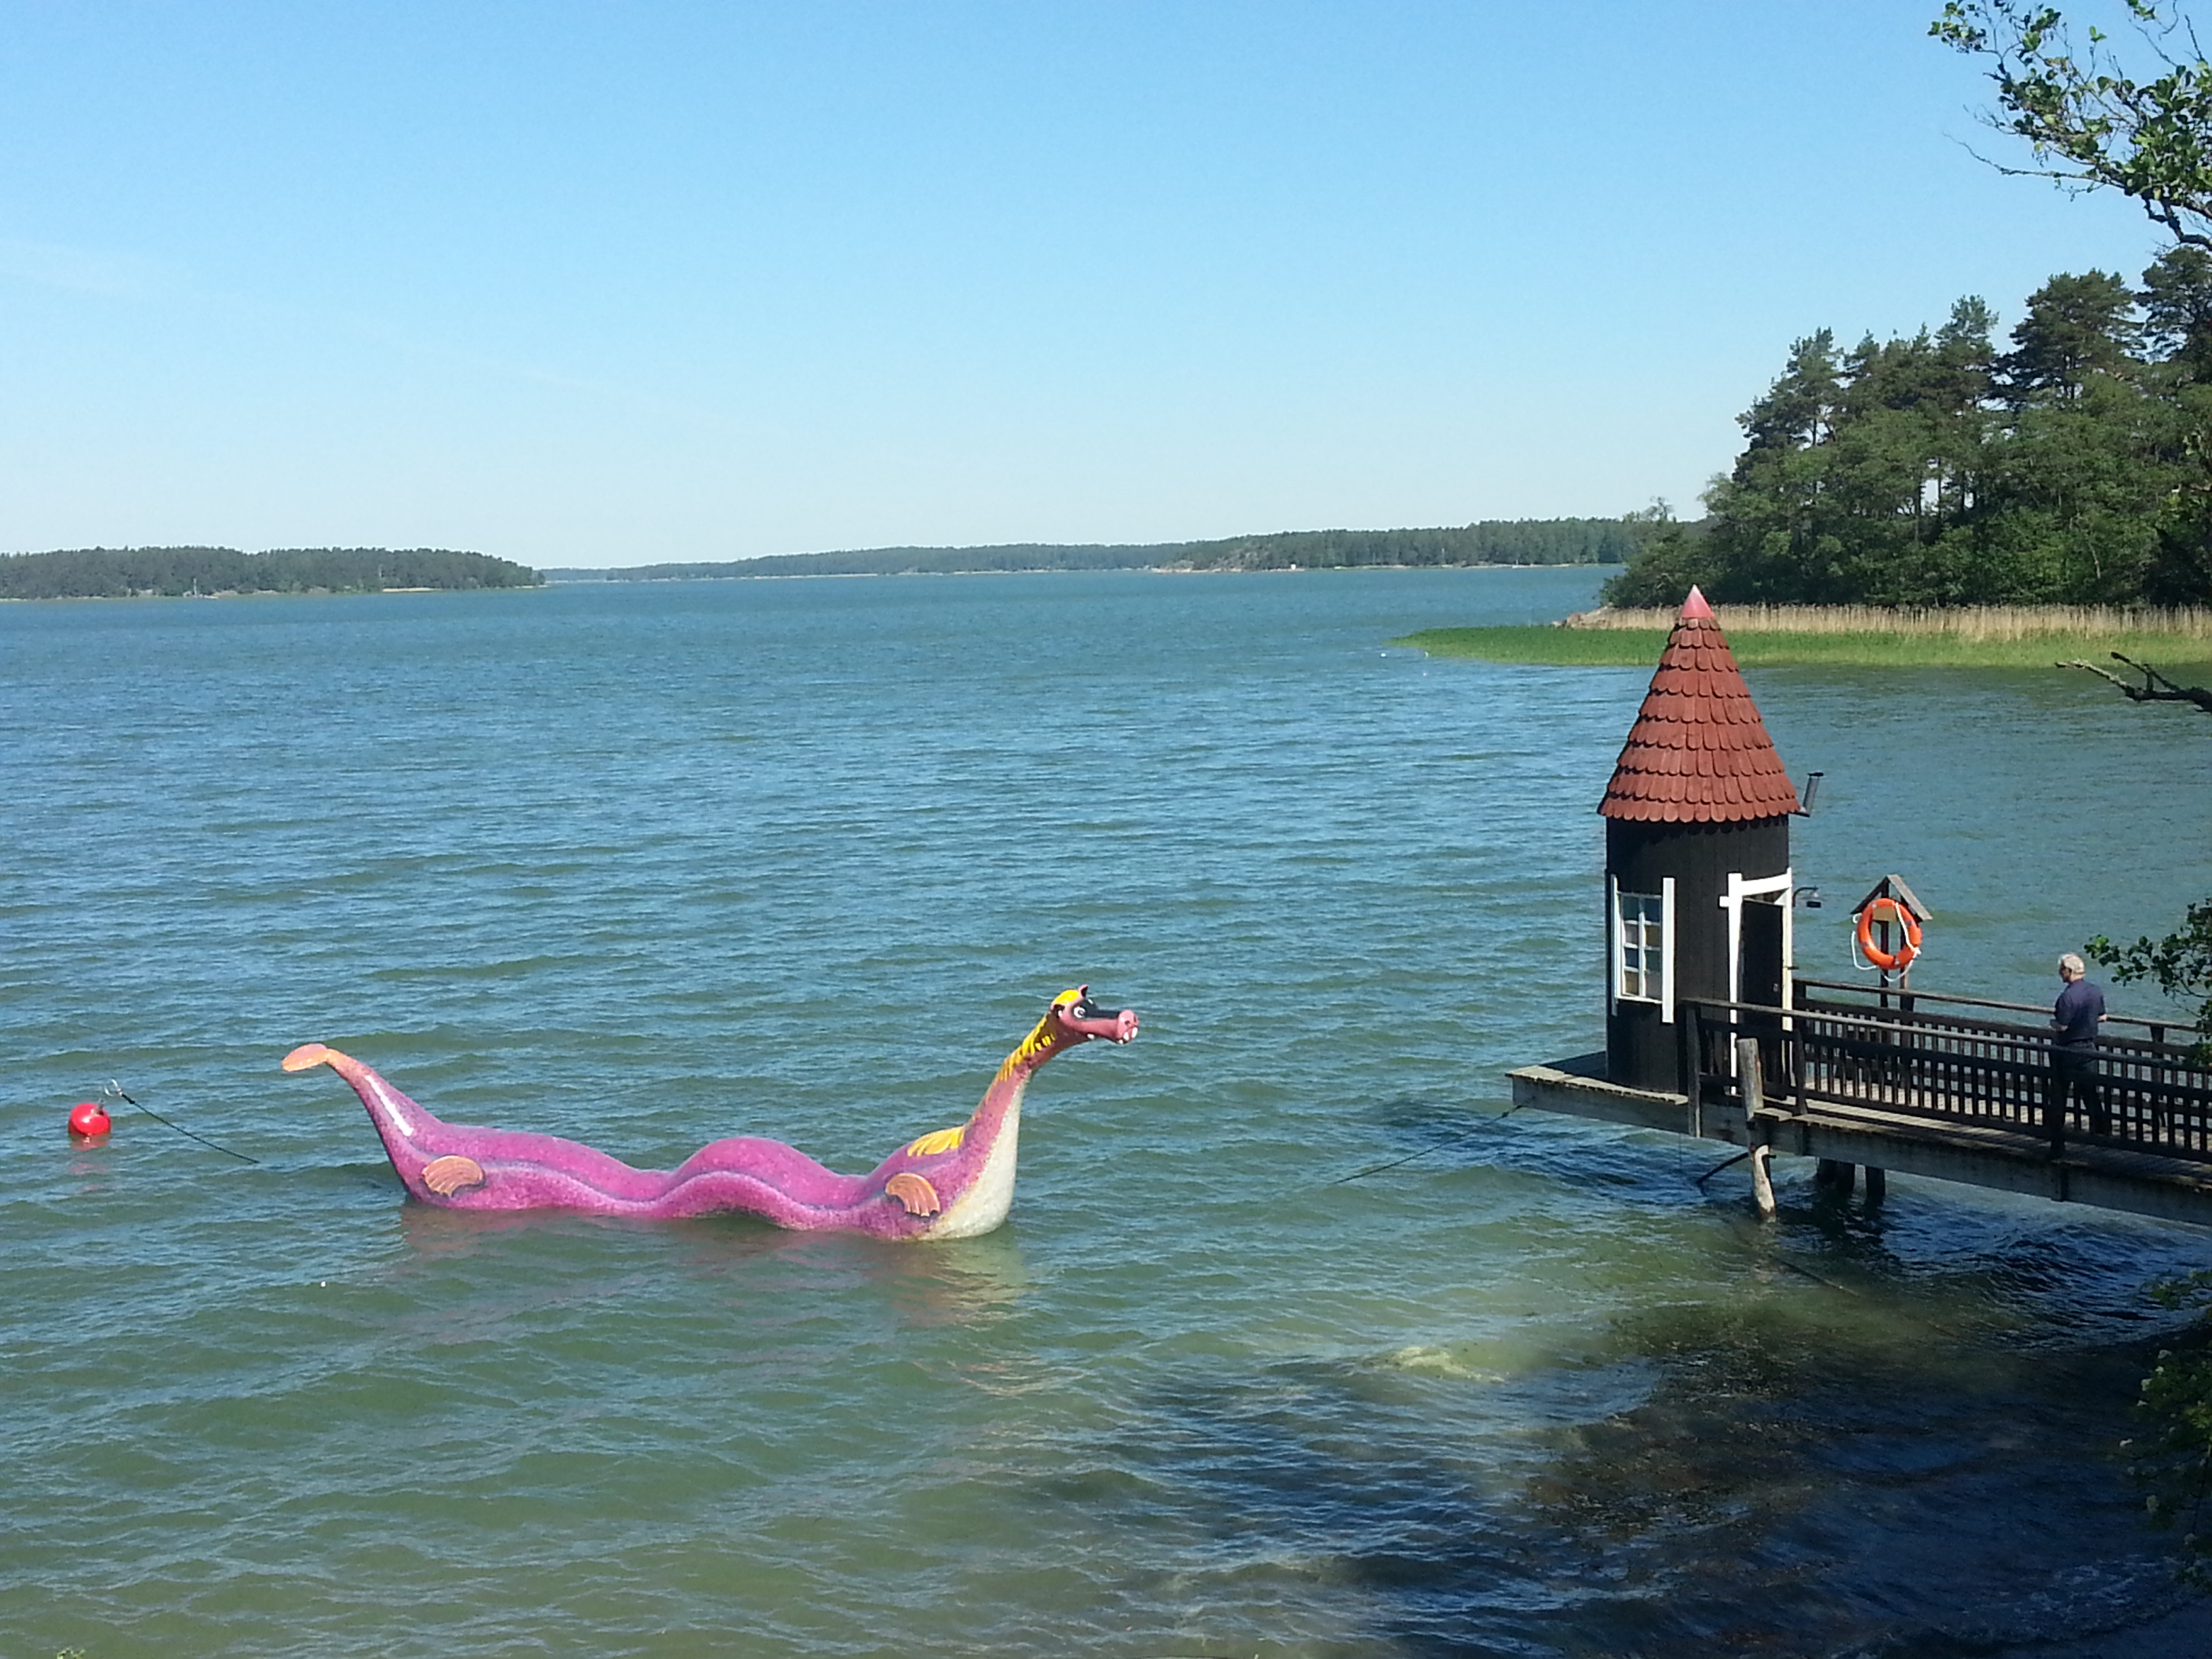 suomen hippos sex shop jyväskylä